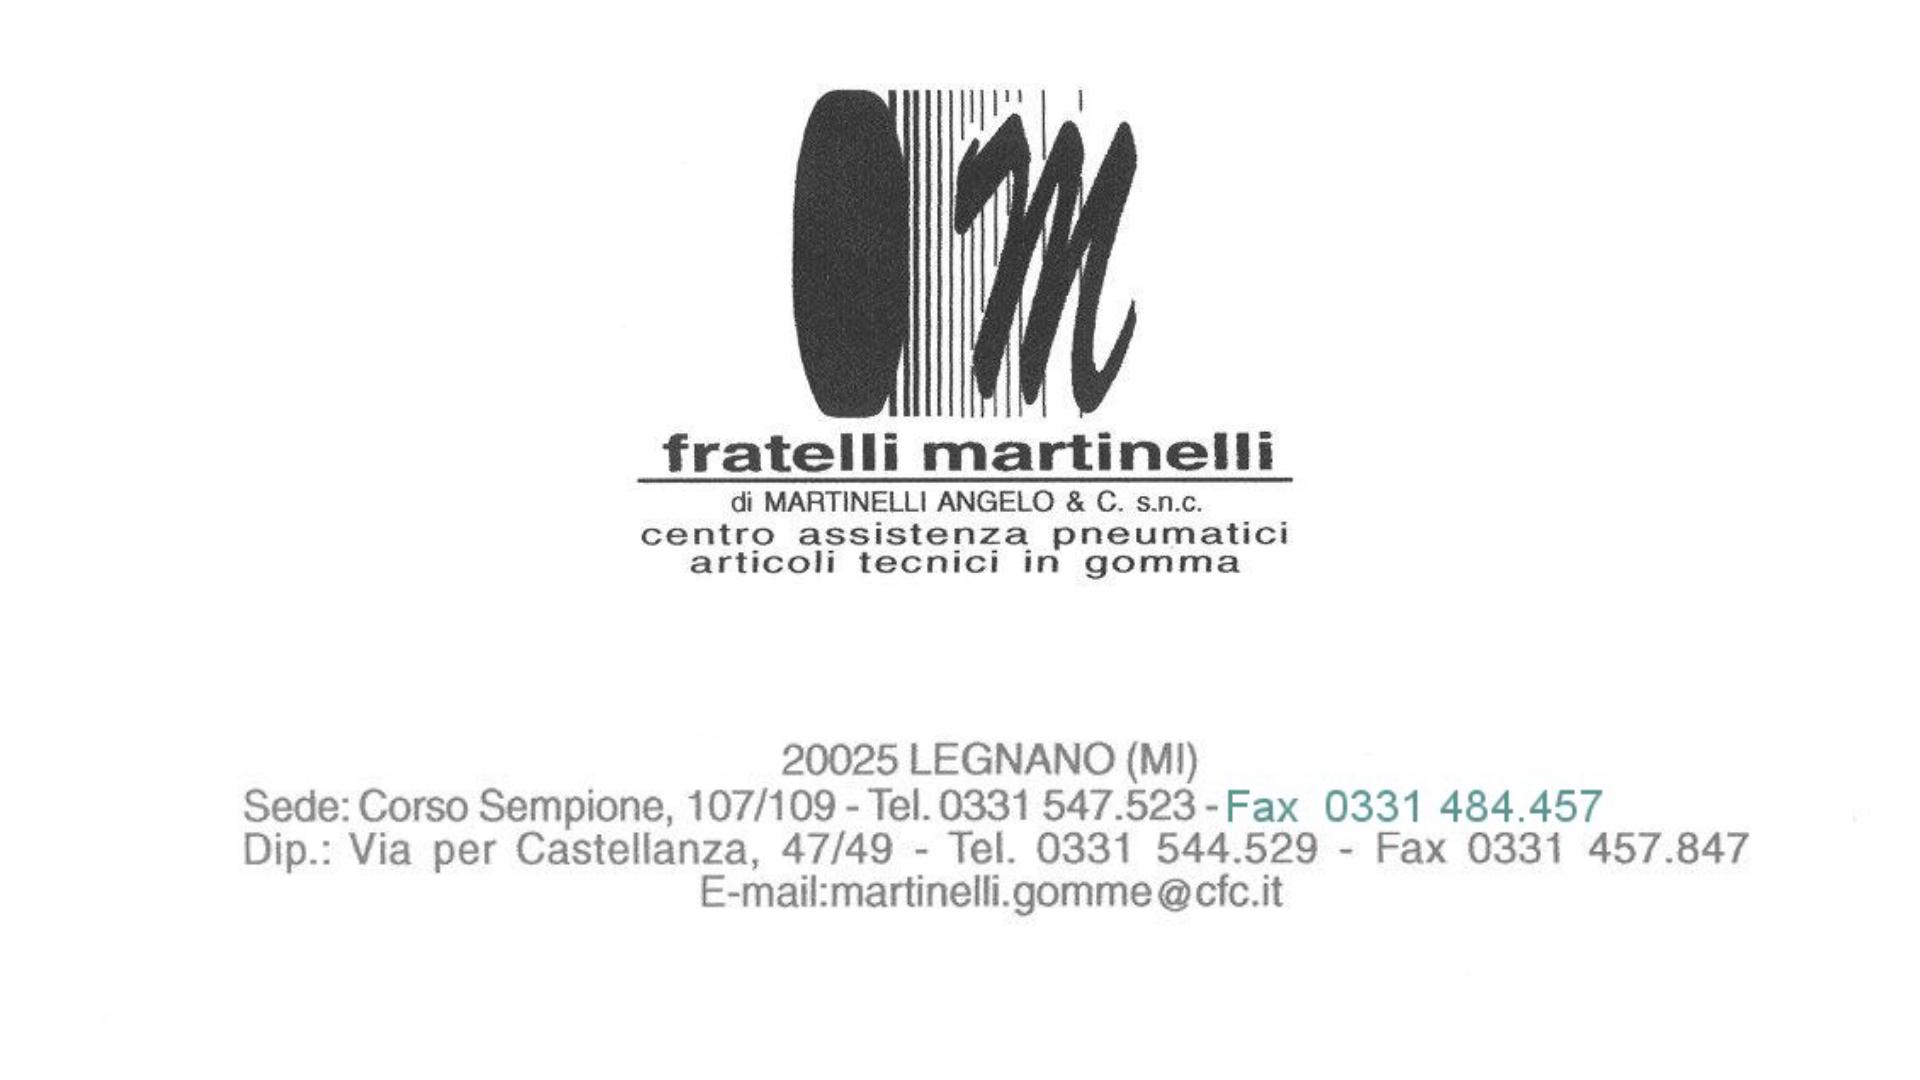 MARTINELLI FRATELLI S.N.C. DI MARTINELLI ANGELO